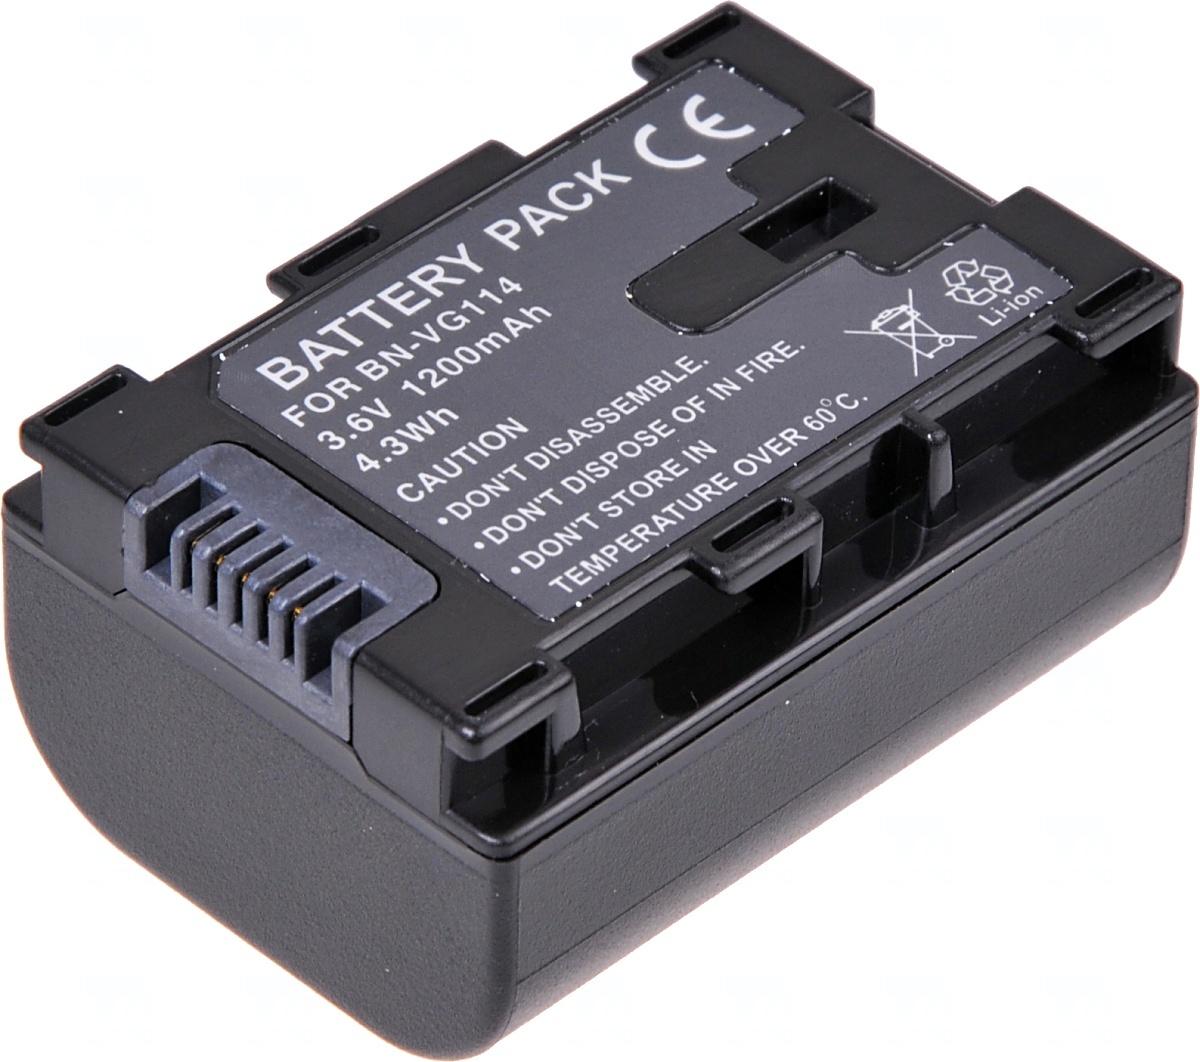 Baterie T6 power JVC BN-VG107, BN-VG108, BN-VG114, 1200mAh, černá (Baterie a gripy)